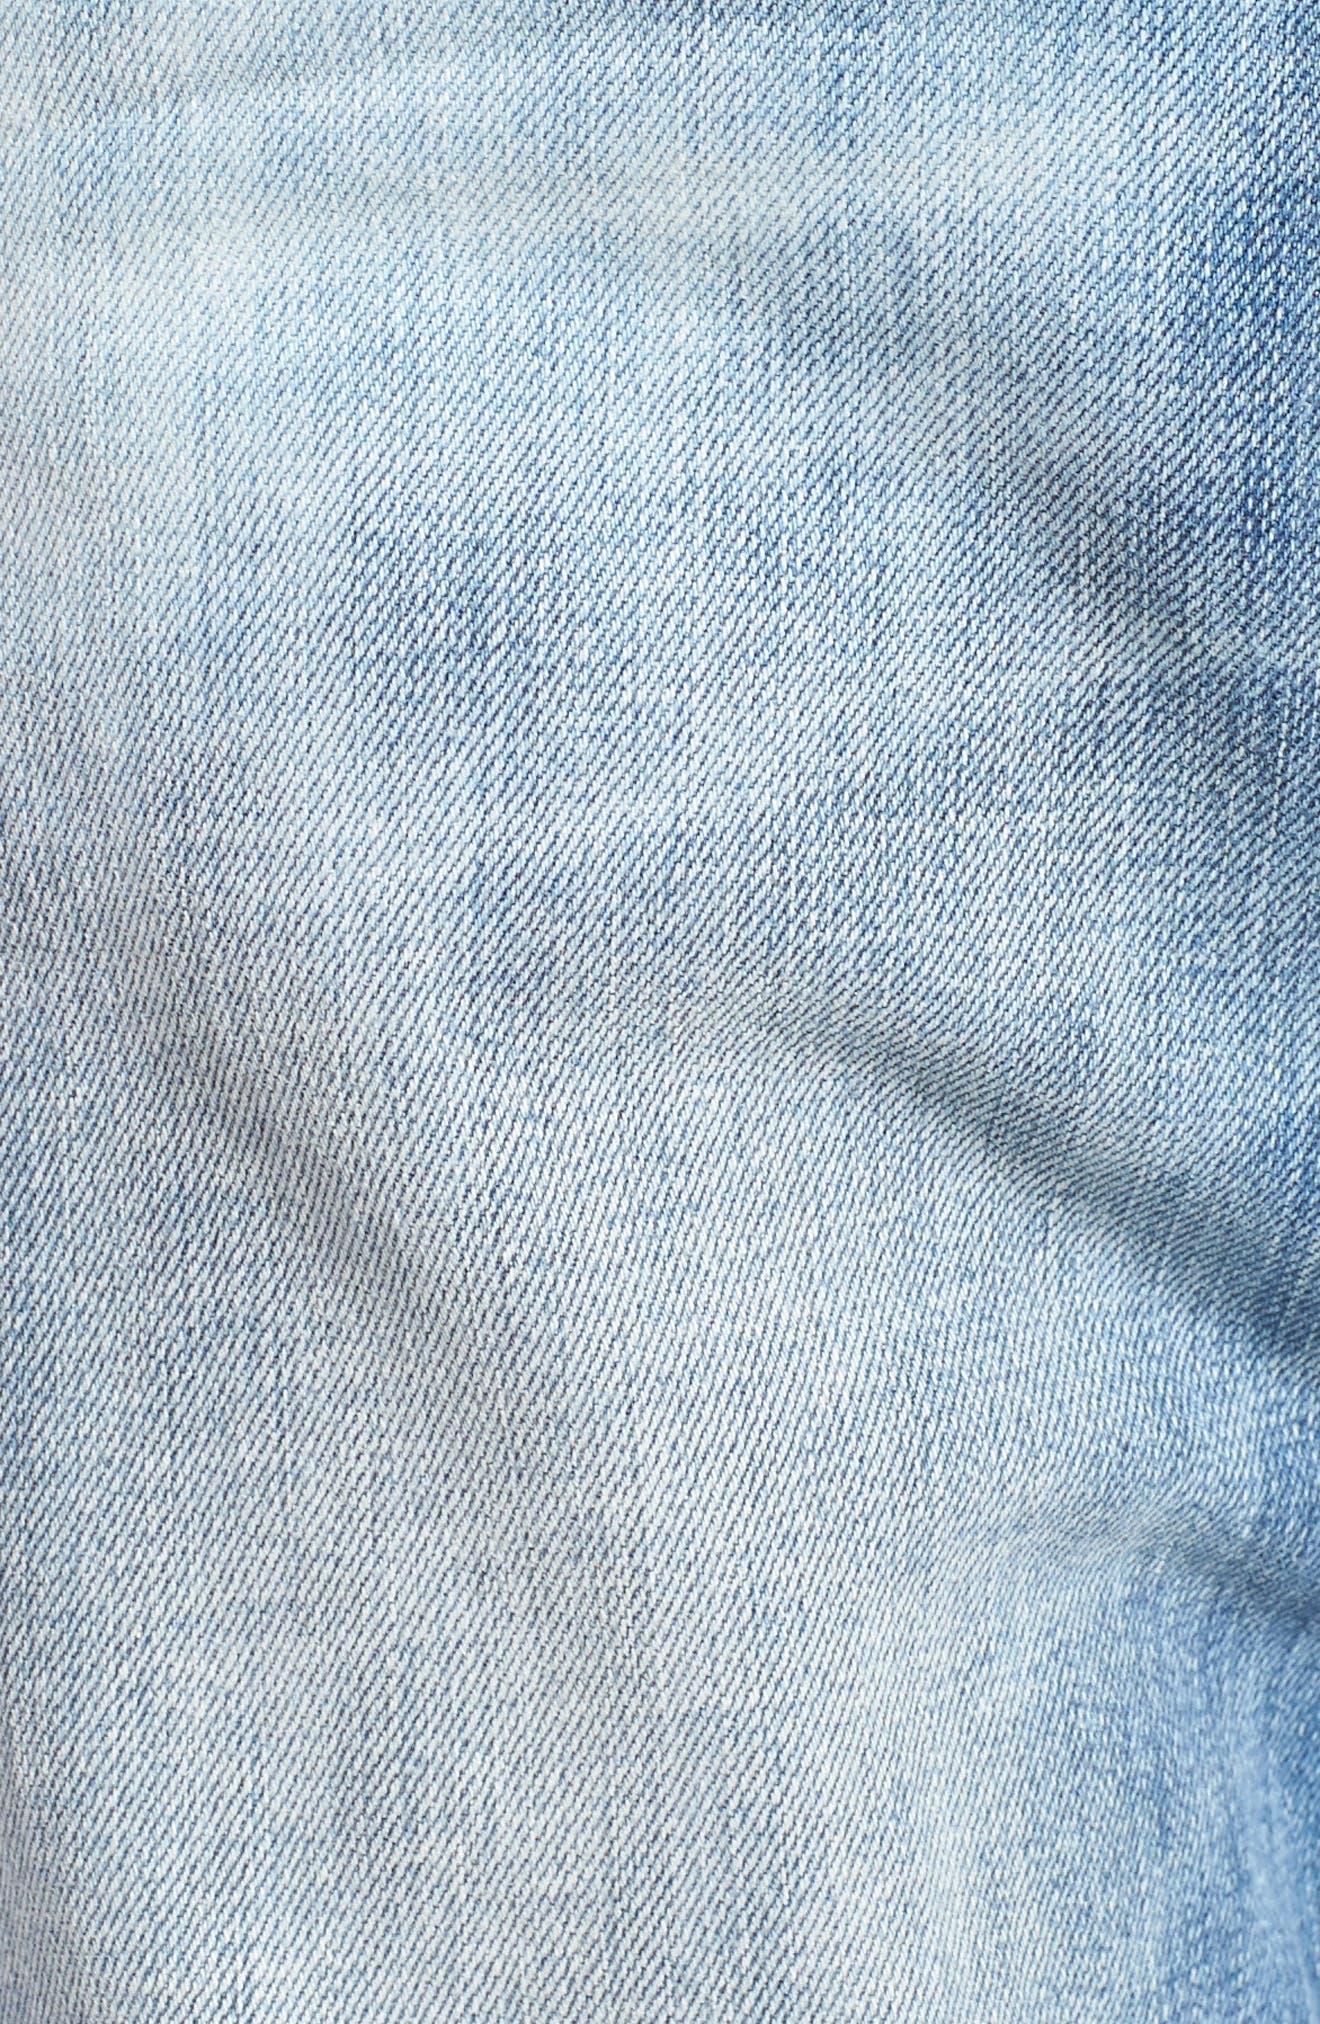 Blinder Skinny Fit Moto Jeans,                             Alternate thumbnail 5, color,                             THRASH